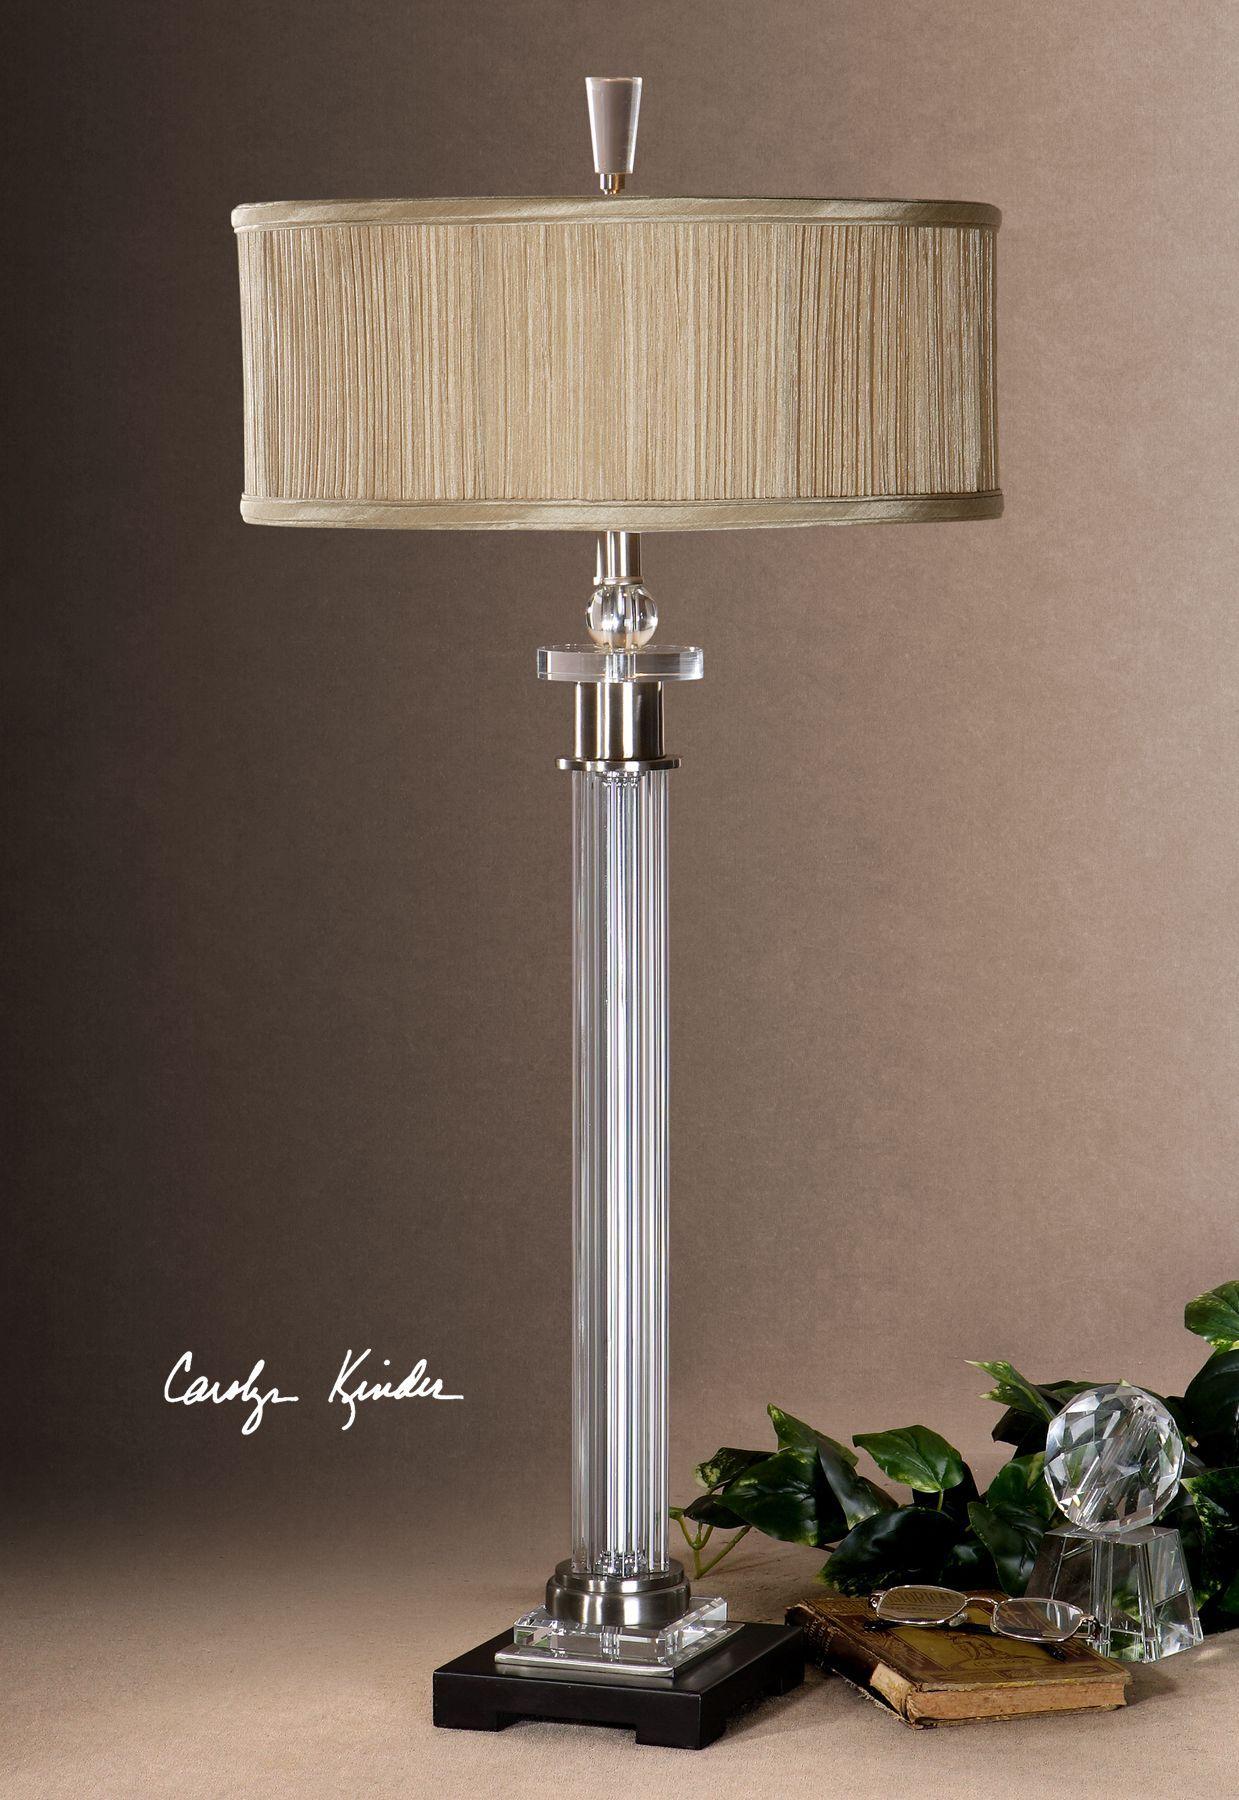 Gunstige Schreibtisch Lampen Lampenschirme Fur Tischlampen Lampen